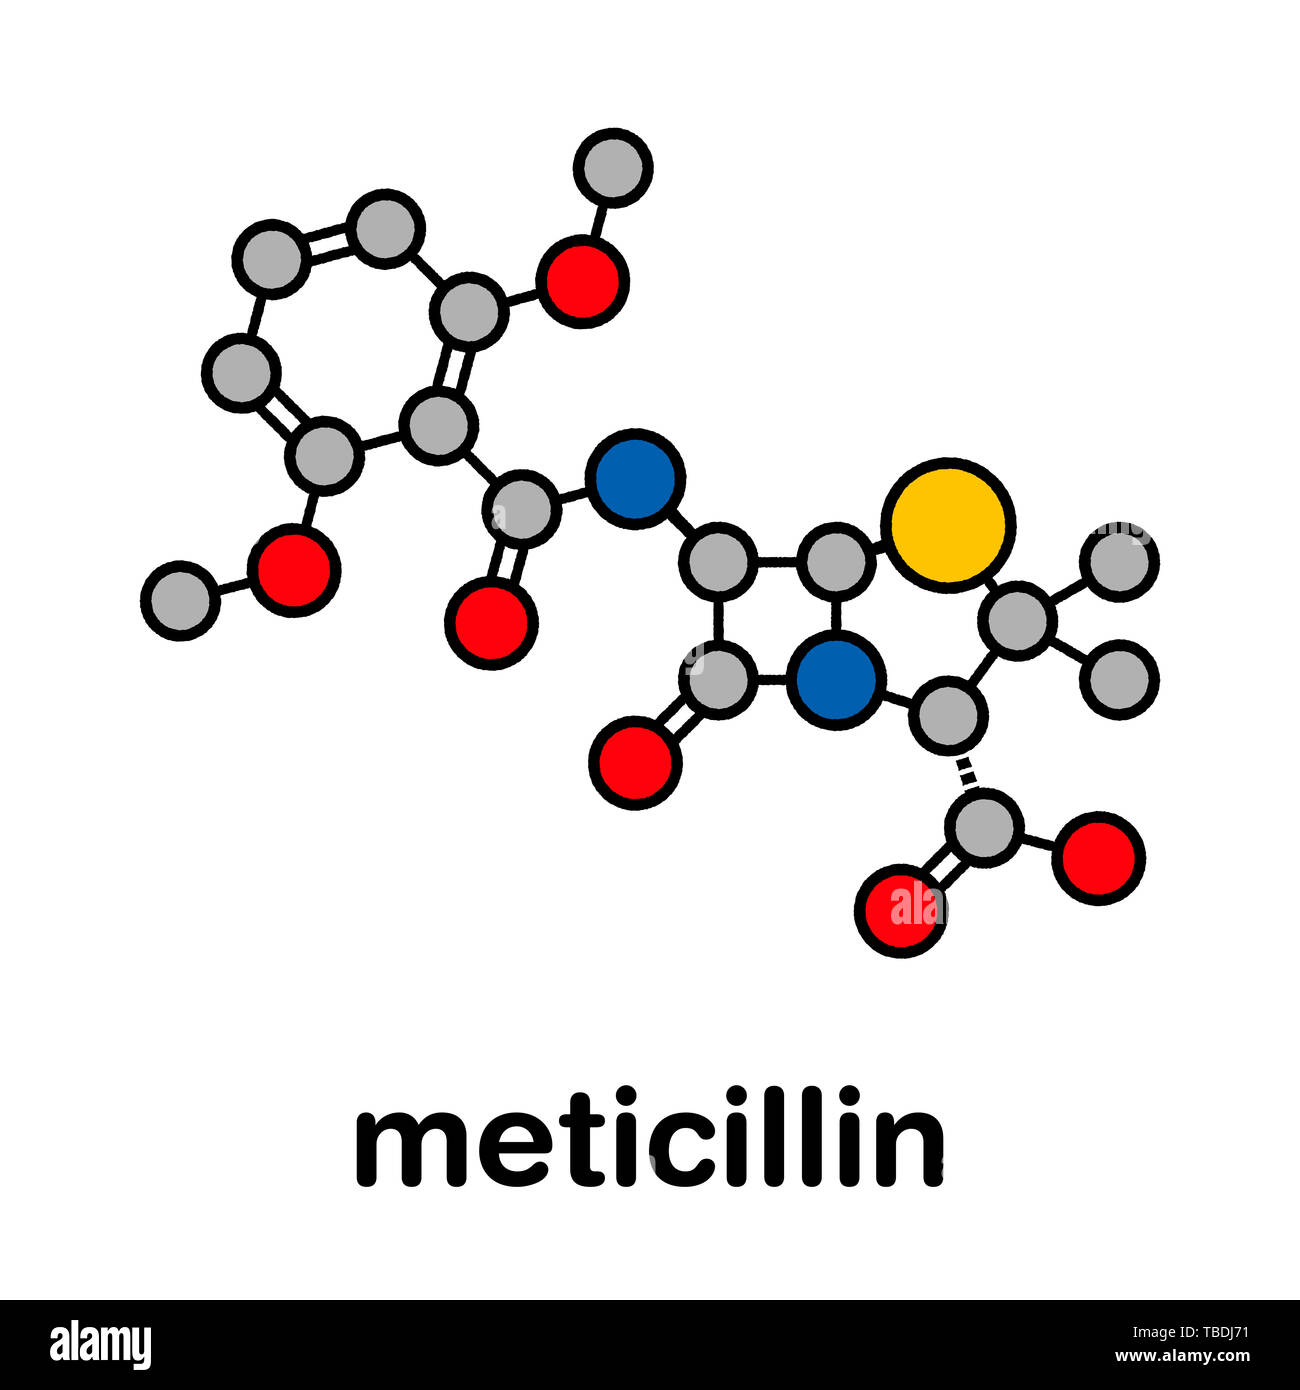 1afe93bd535d Meticillin farmaci antibiotici (beta-lattamici classe molecola). MRSA è  sinonimo di Staphylococcus